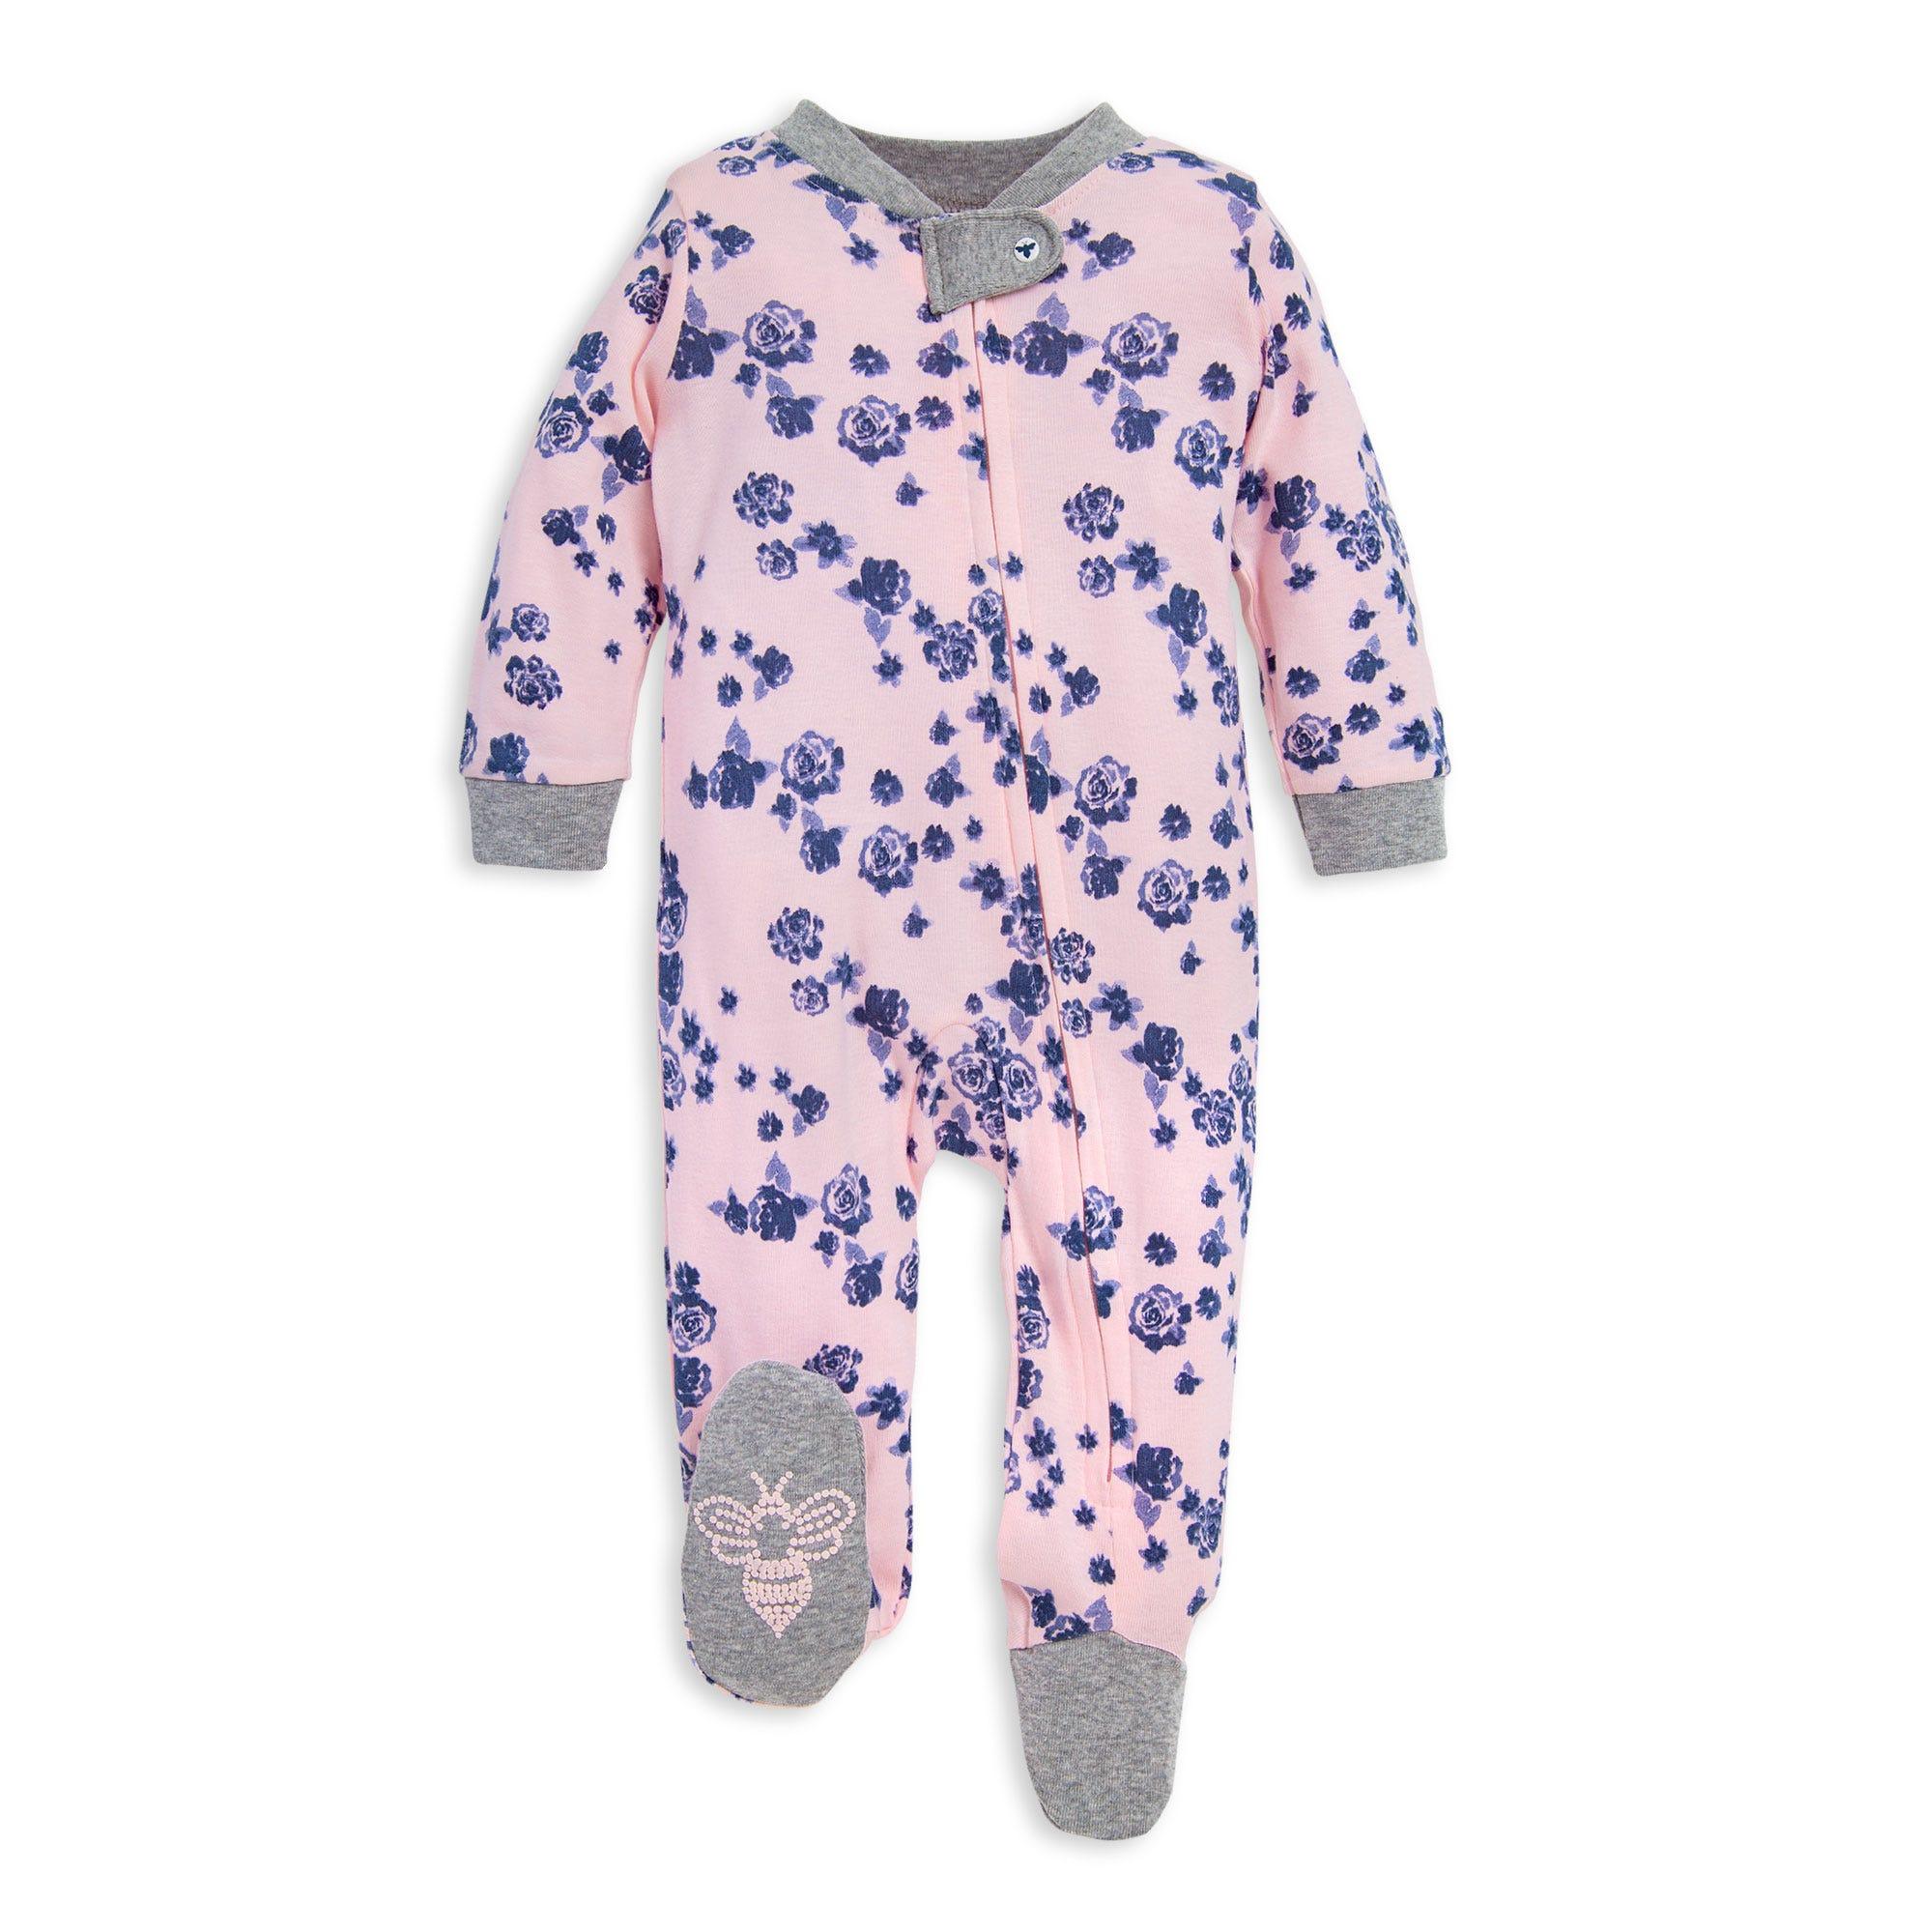 Essentials Baby Snug-fit Cotton Footed Sleeper Pajamas